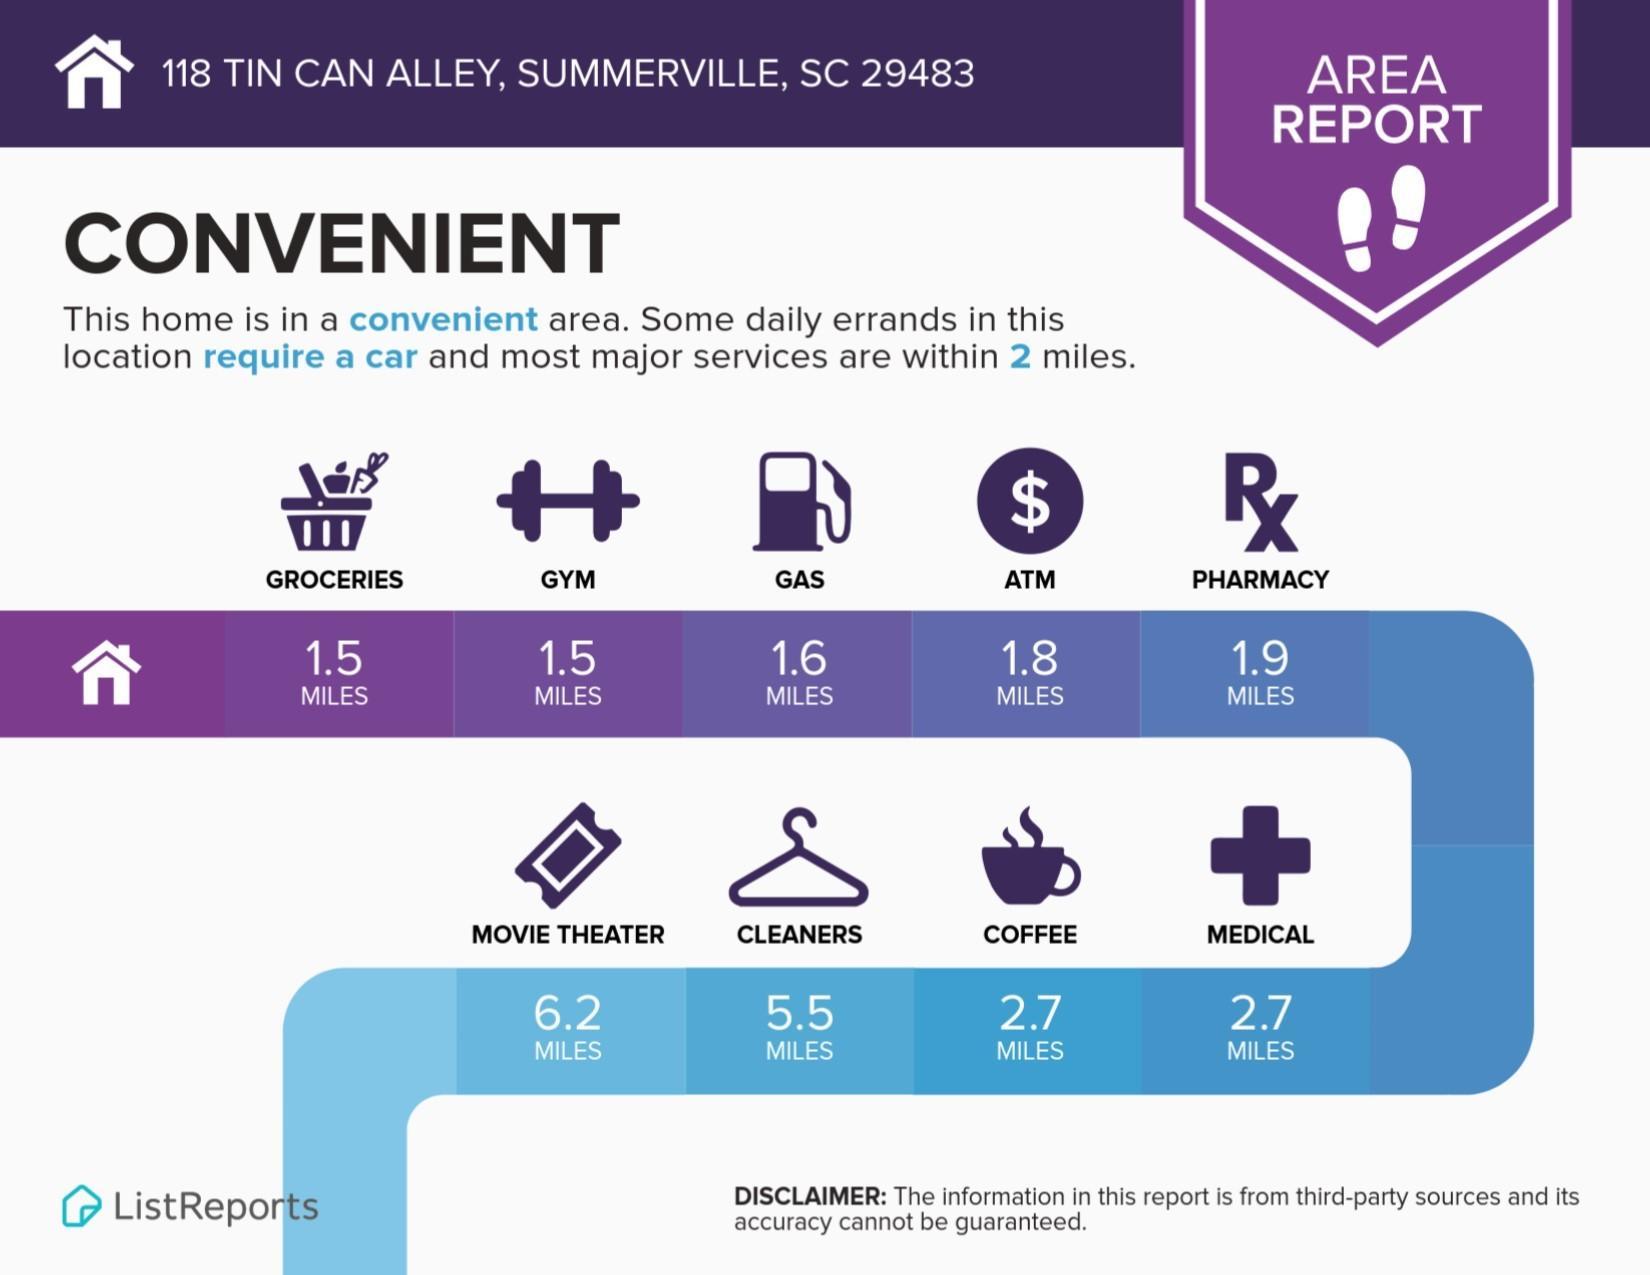 118 Tin Can Alley Summerville, SC 29483